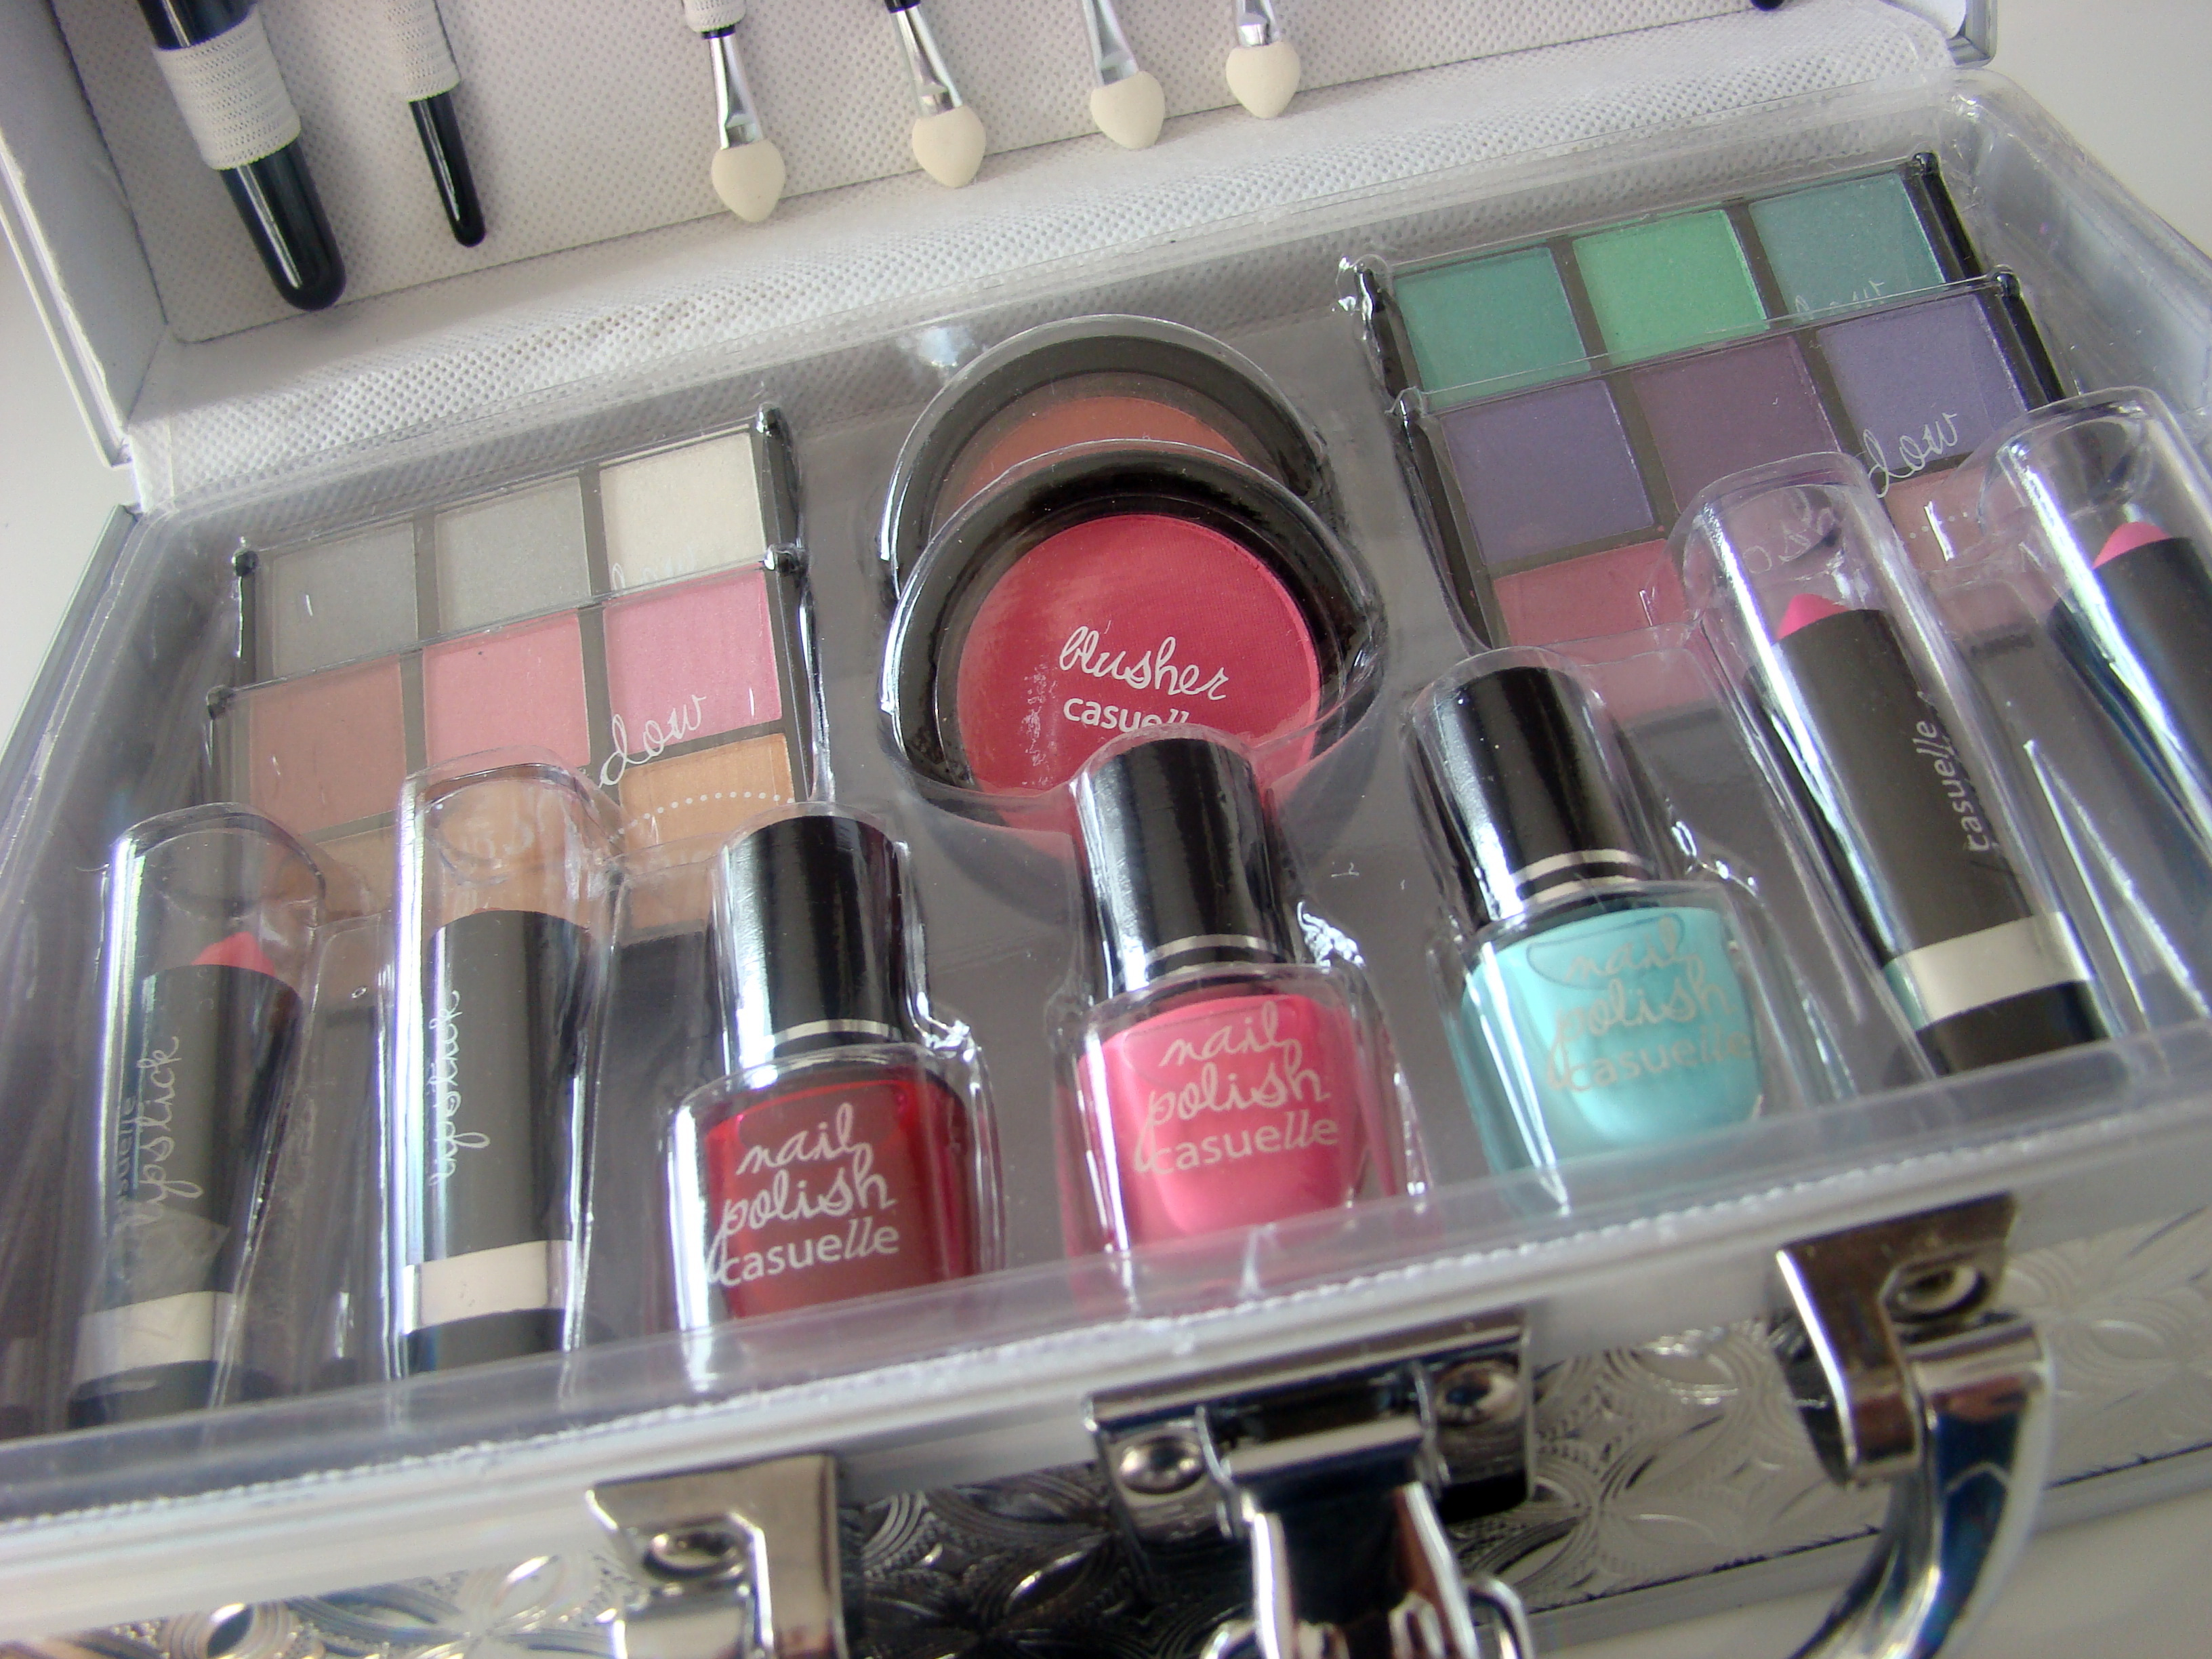 complete make up doos casuelle liketobeagirl